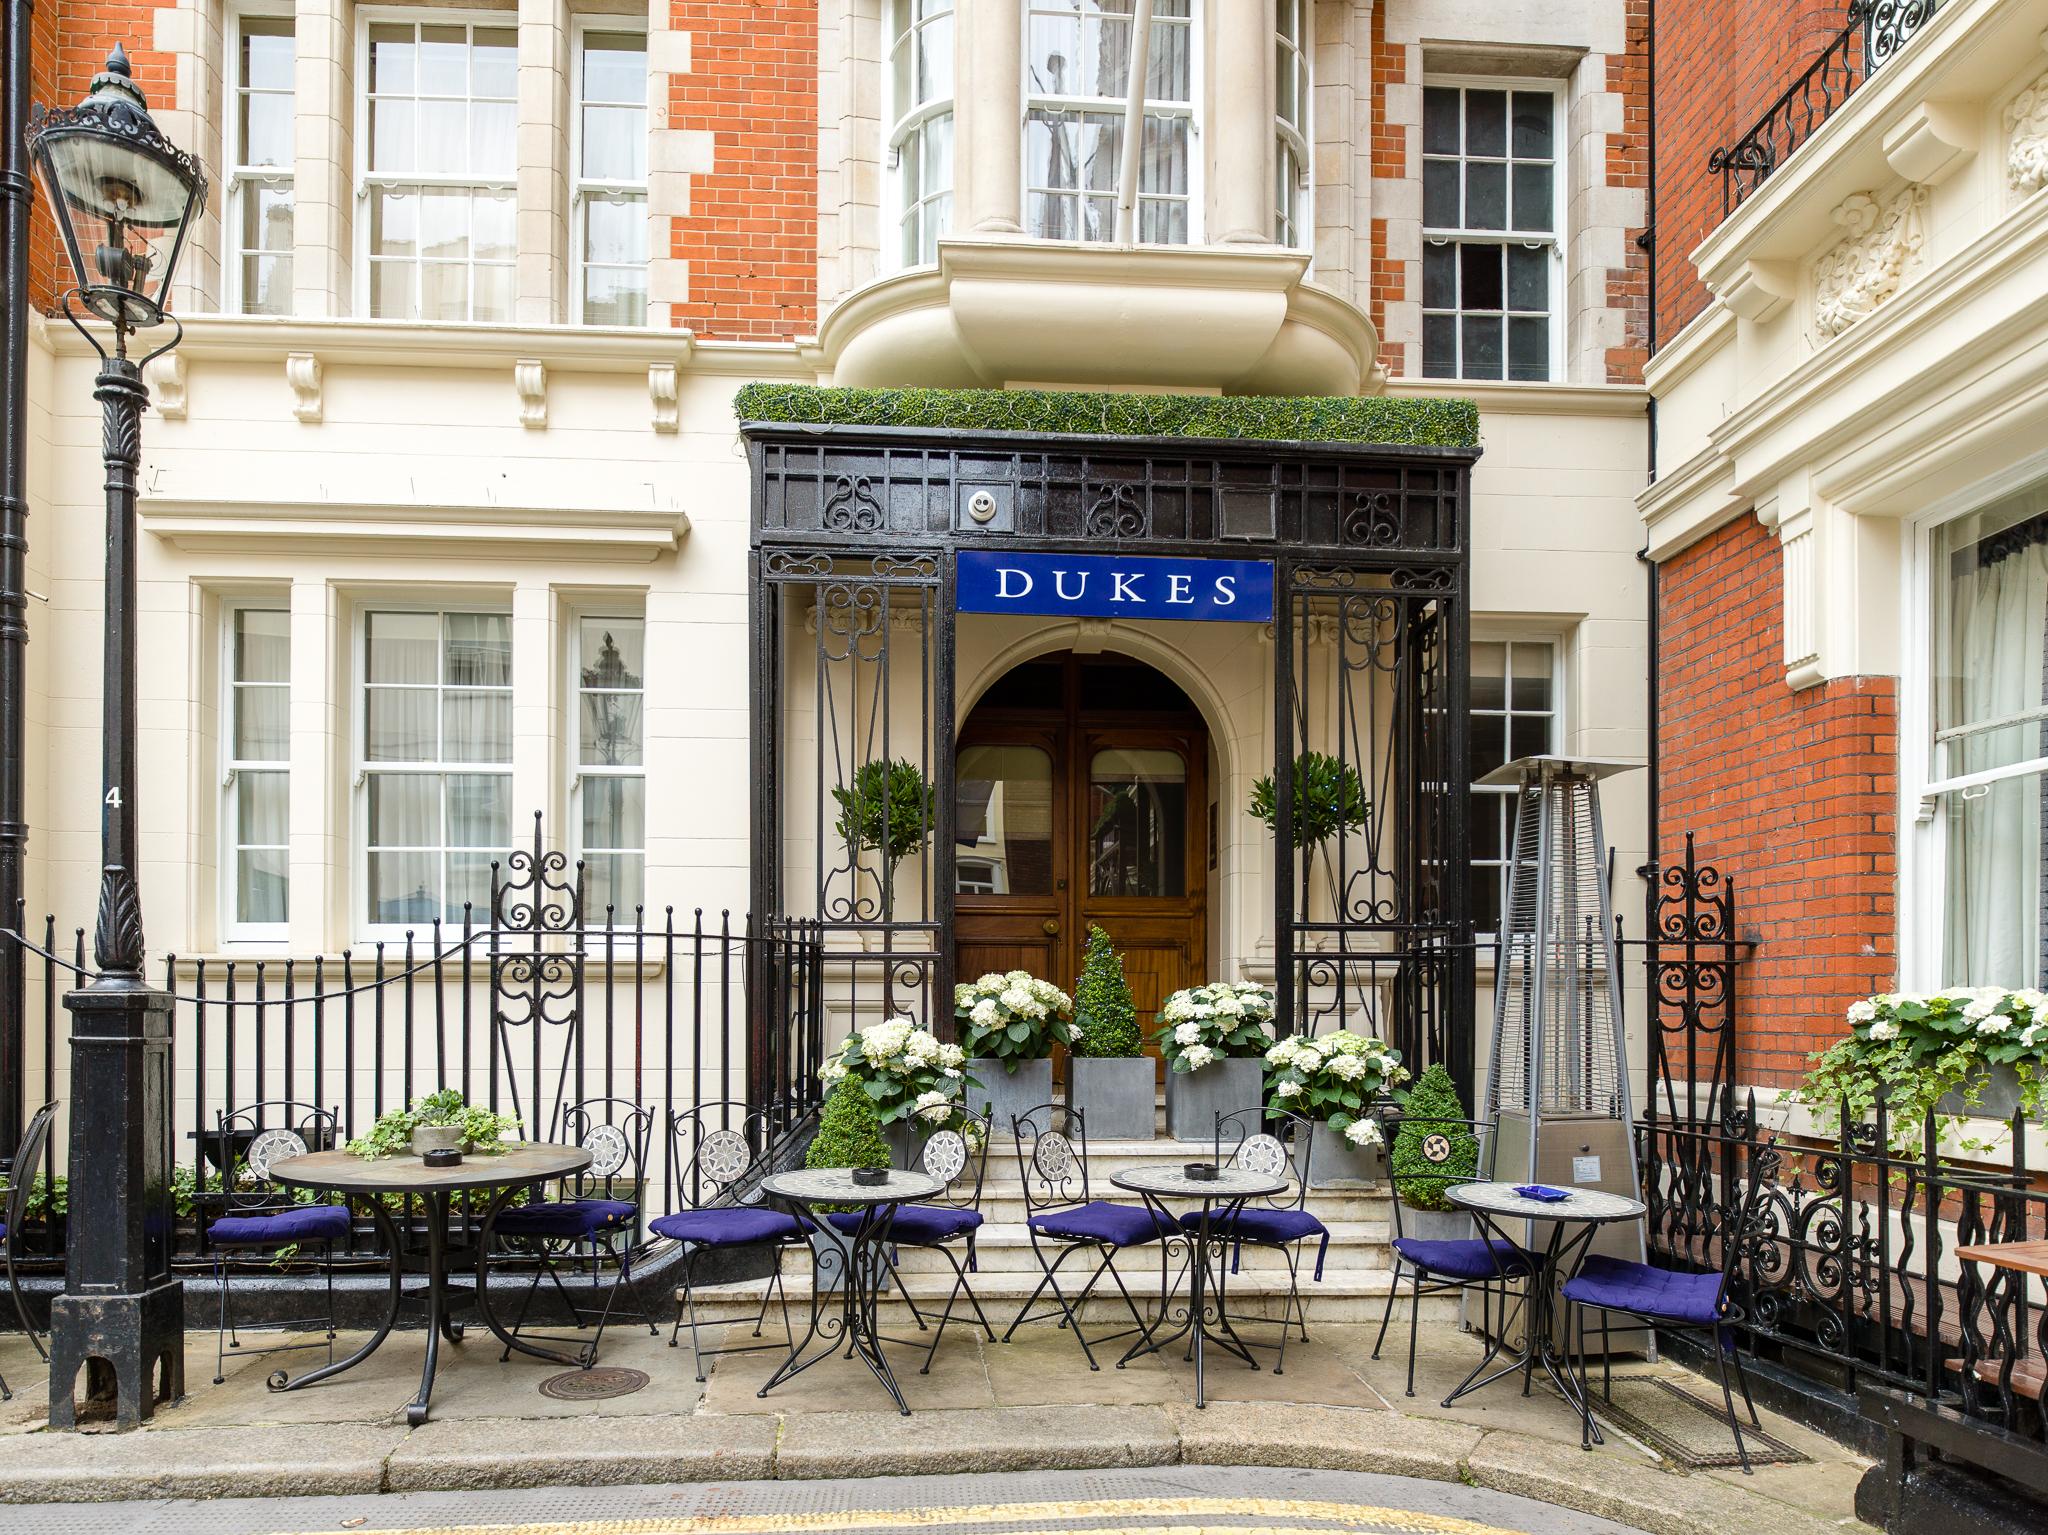 002_Dukes_Hotel_London_150818